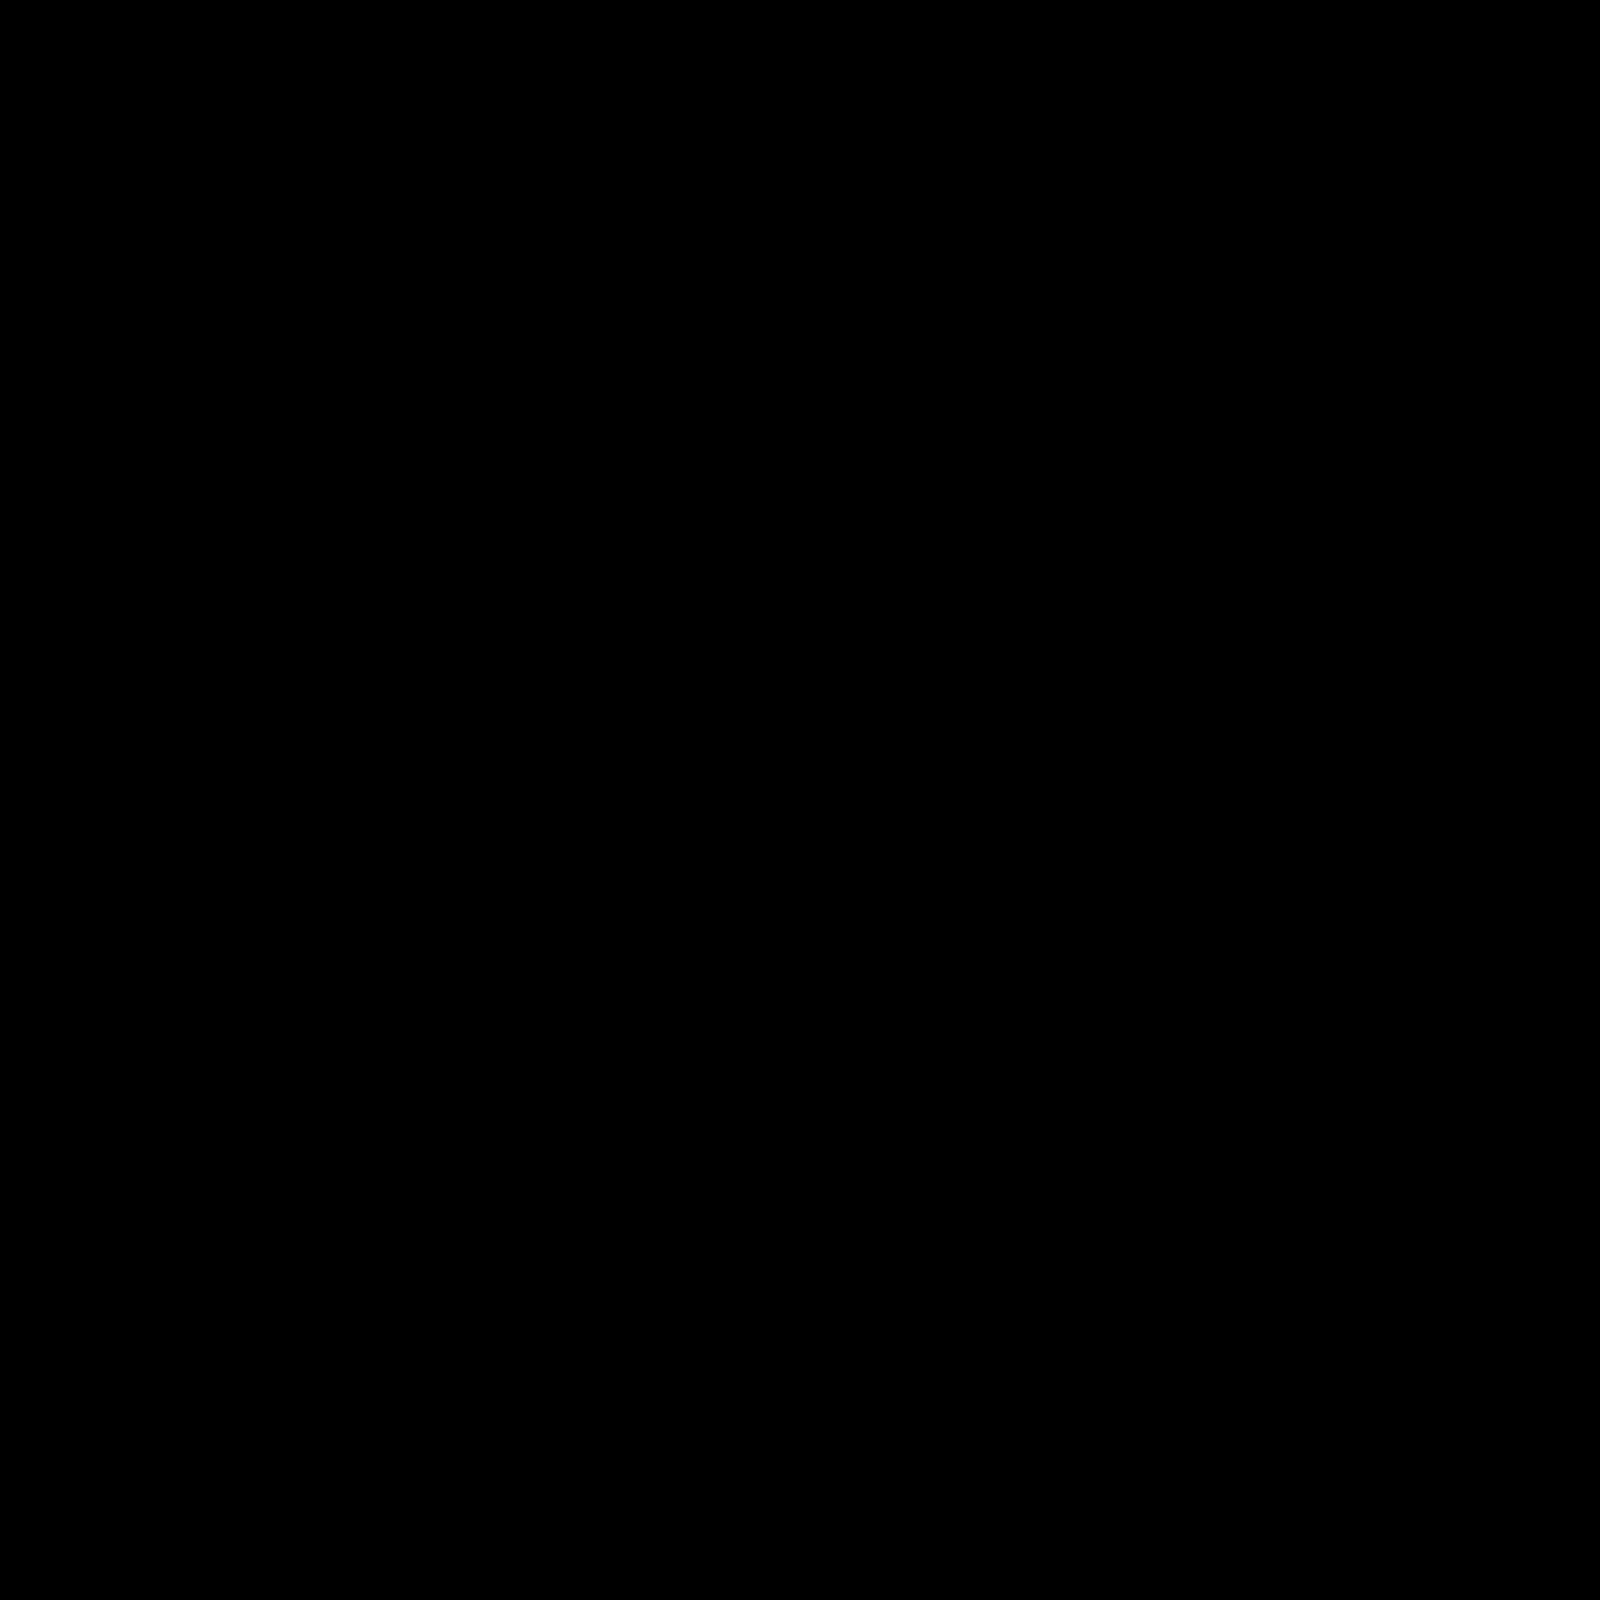 Land Mine Filled icon